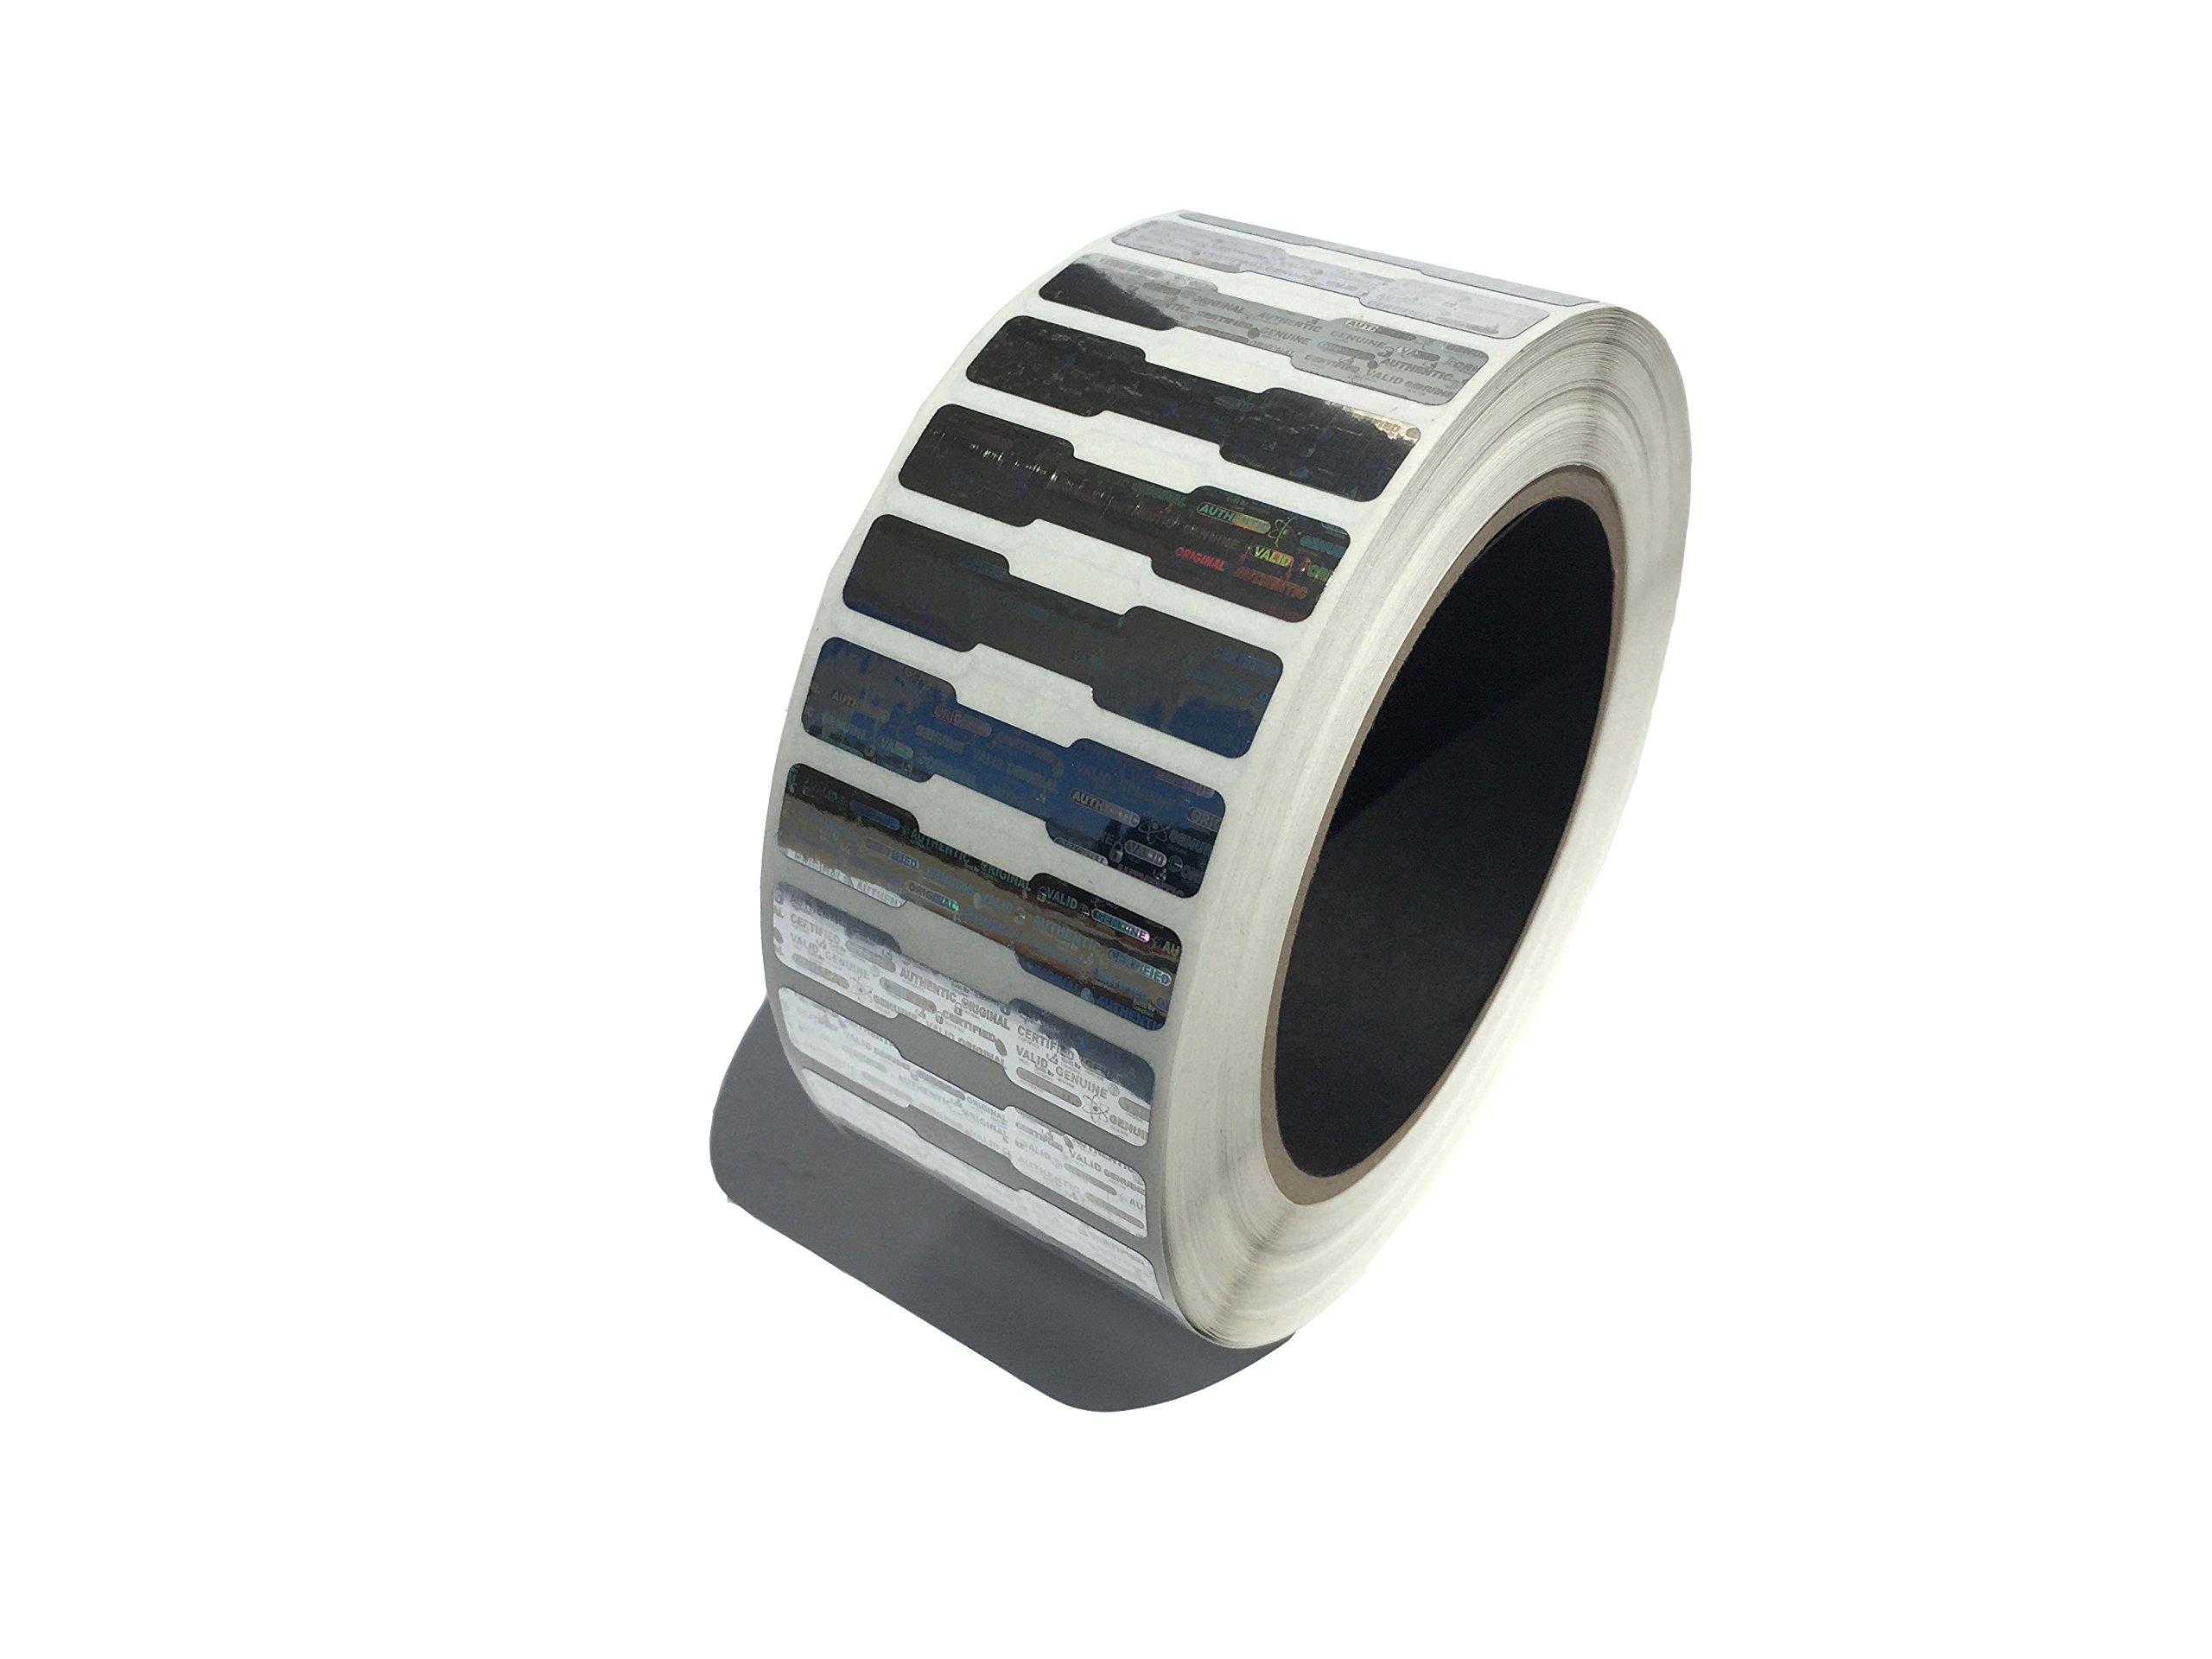 5,000 Silver Dog Bone Hologram Sticker TamperMax Tamper Evident Security Label Holographic Seal Sticker, size 1.75'' x 0.375'' (44mm x 9mm).